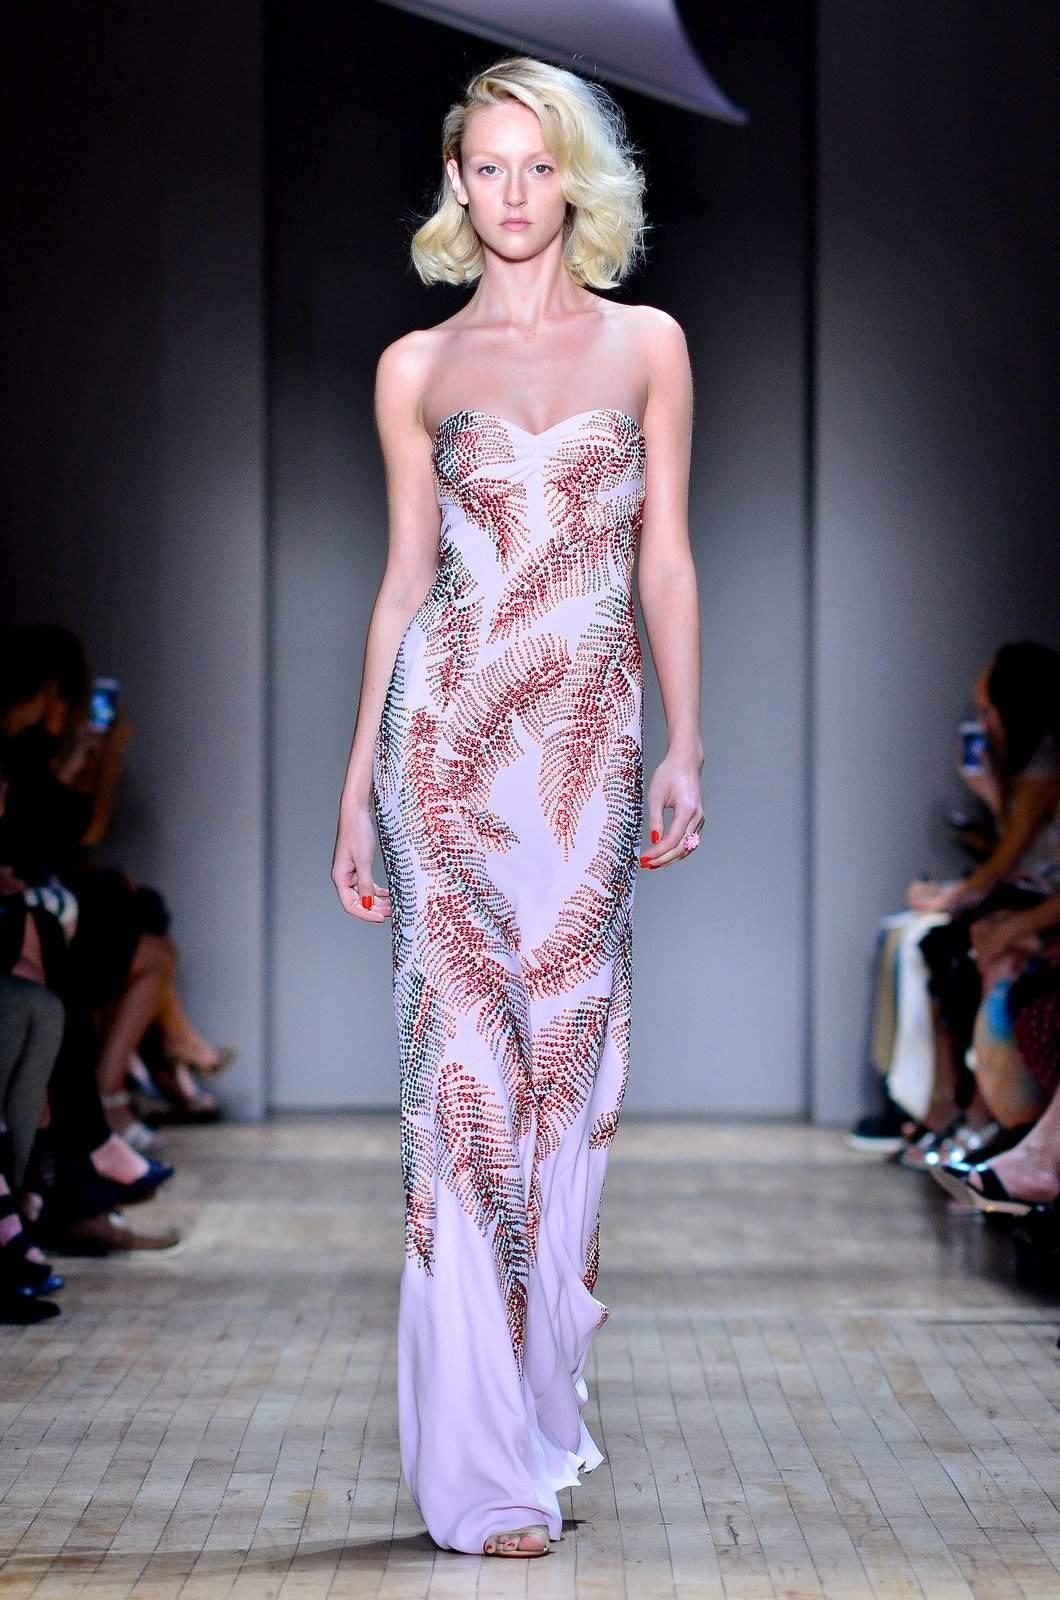 jenny packham2 Jenny Packham Spring/Summer Collection 2015 at NYC Fashion Week